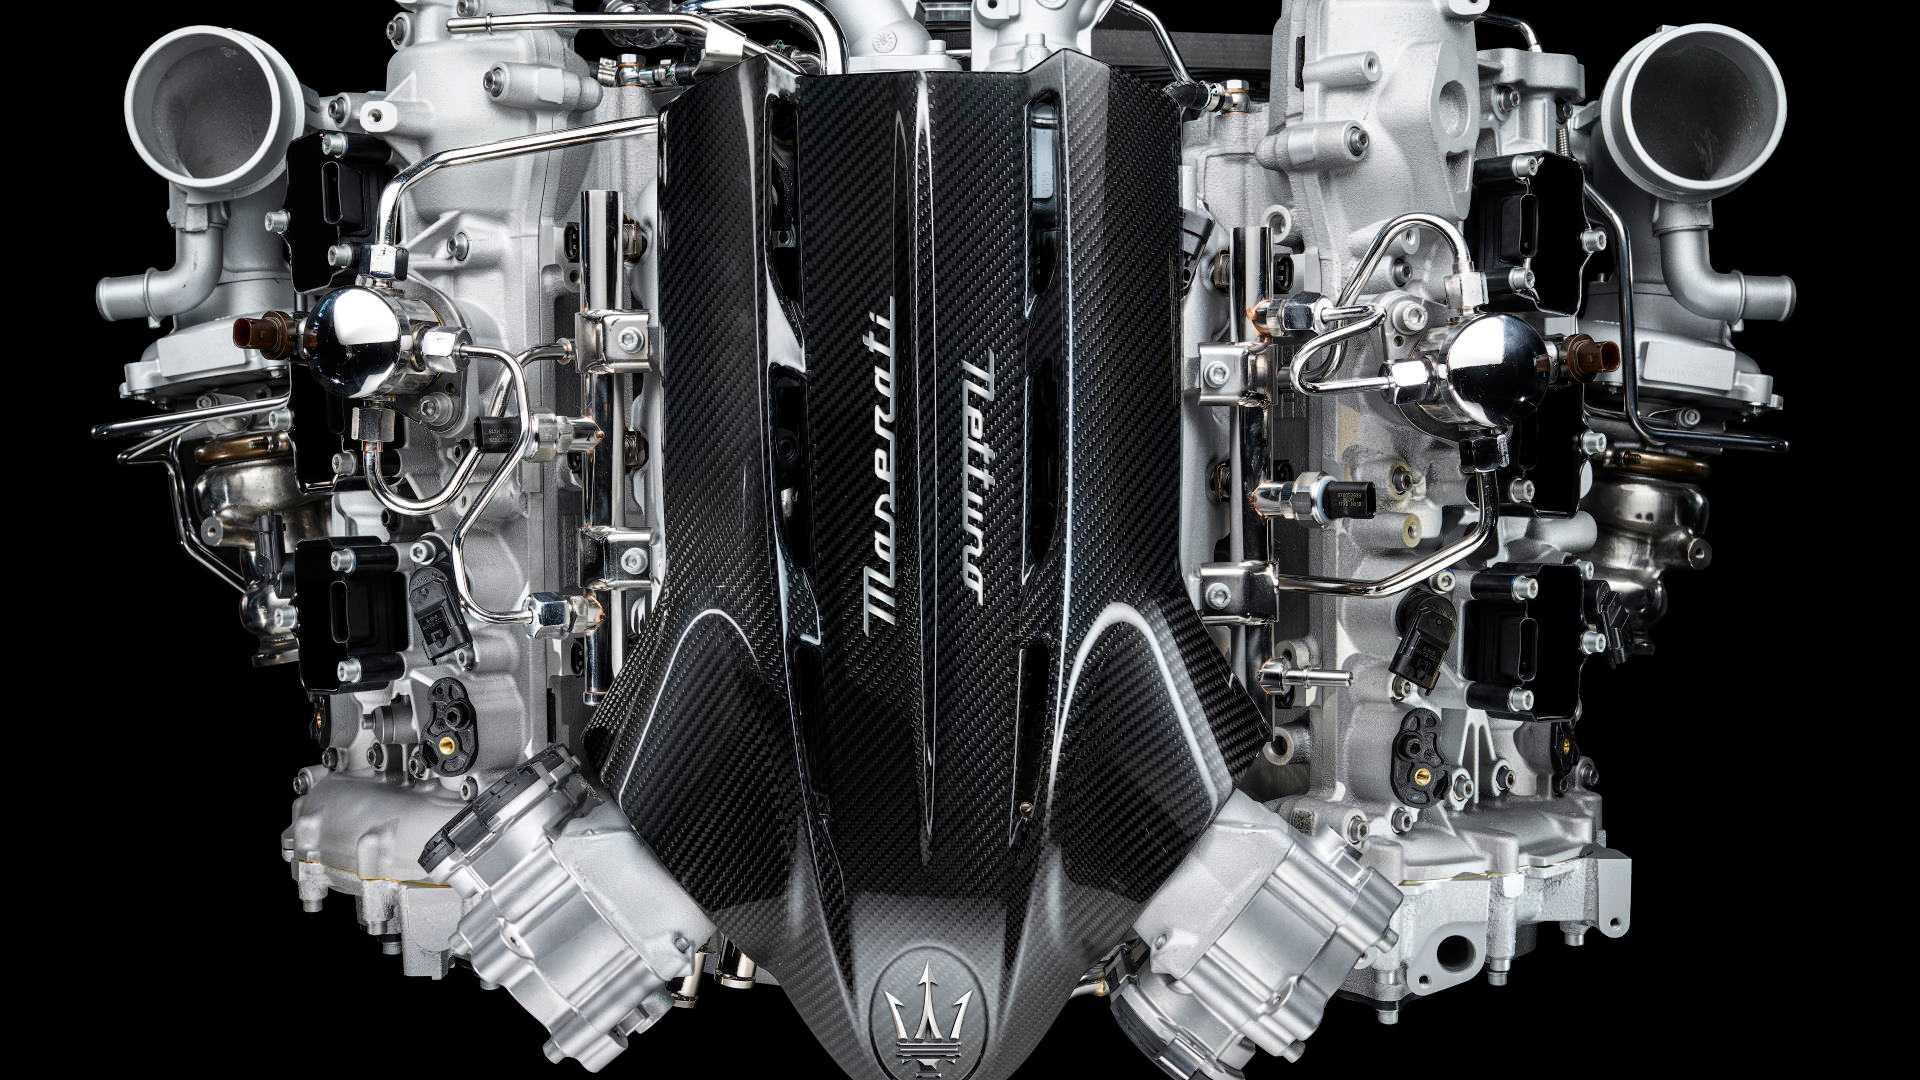 Maserati MC20 engine